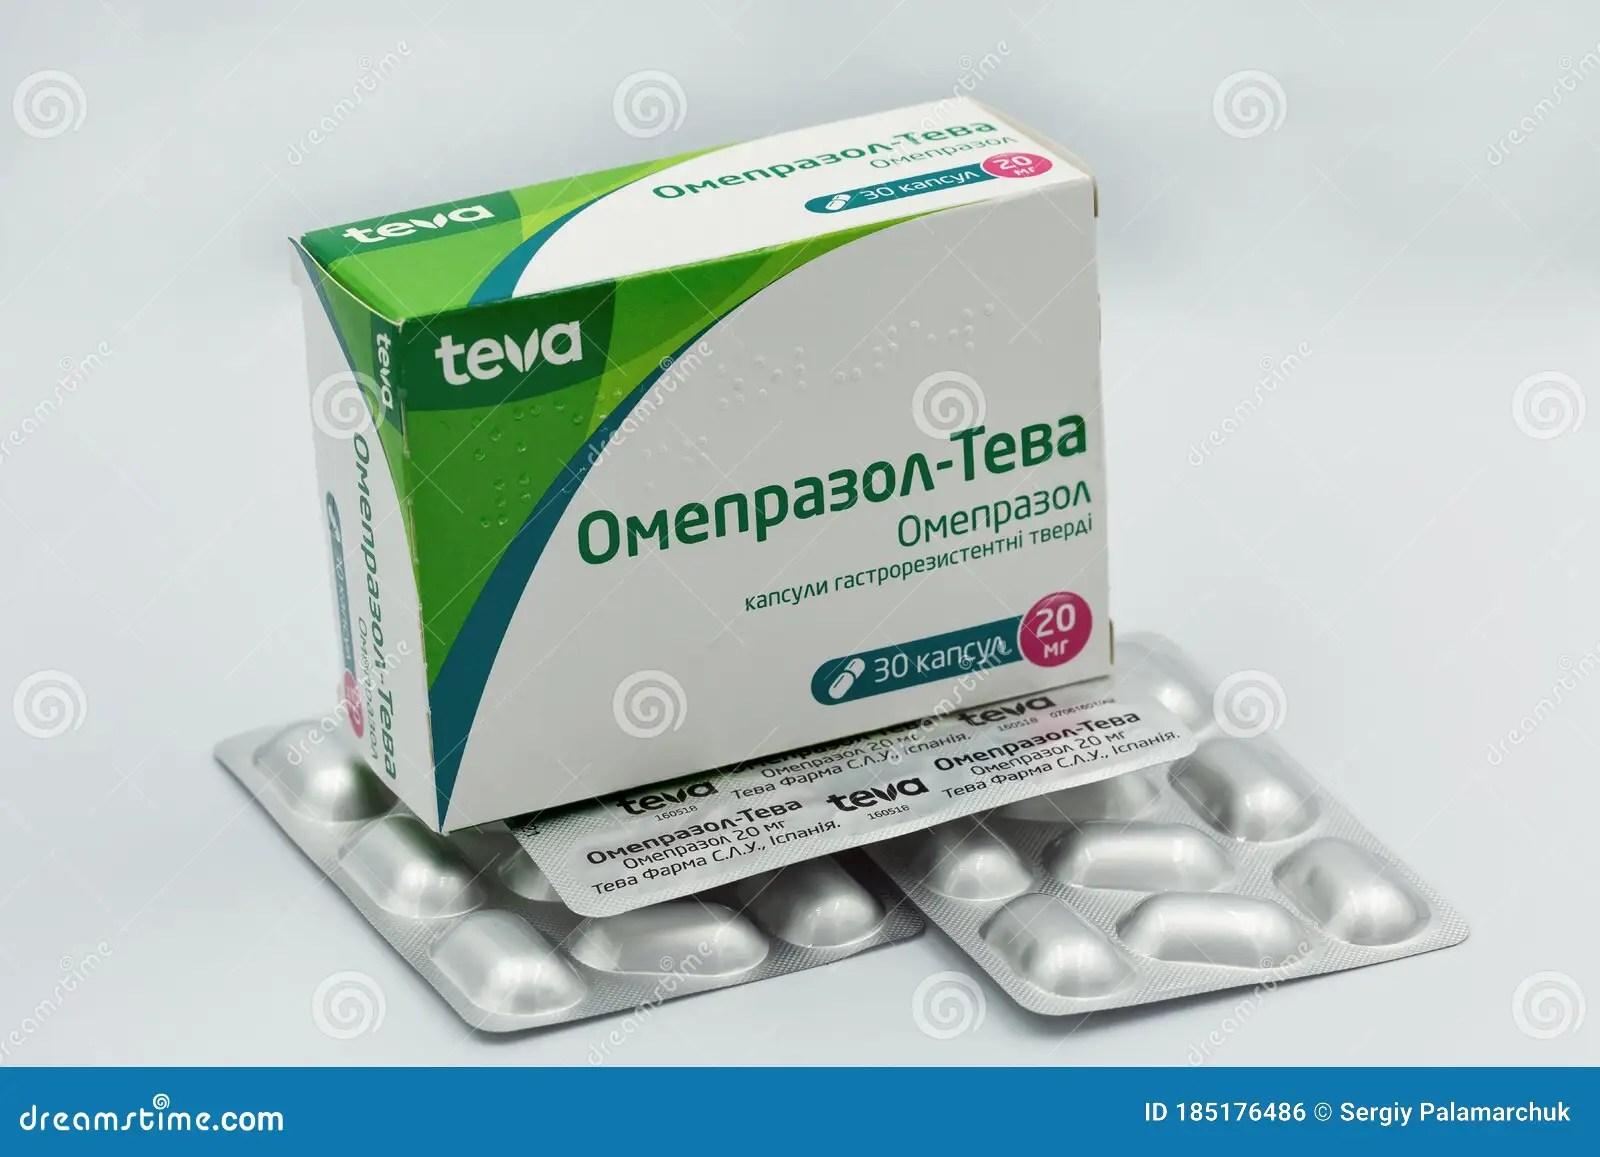 Omeprazole Generic Drug Box By Teva Closeup Against White ...